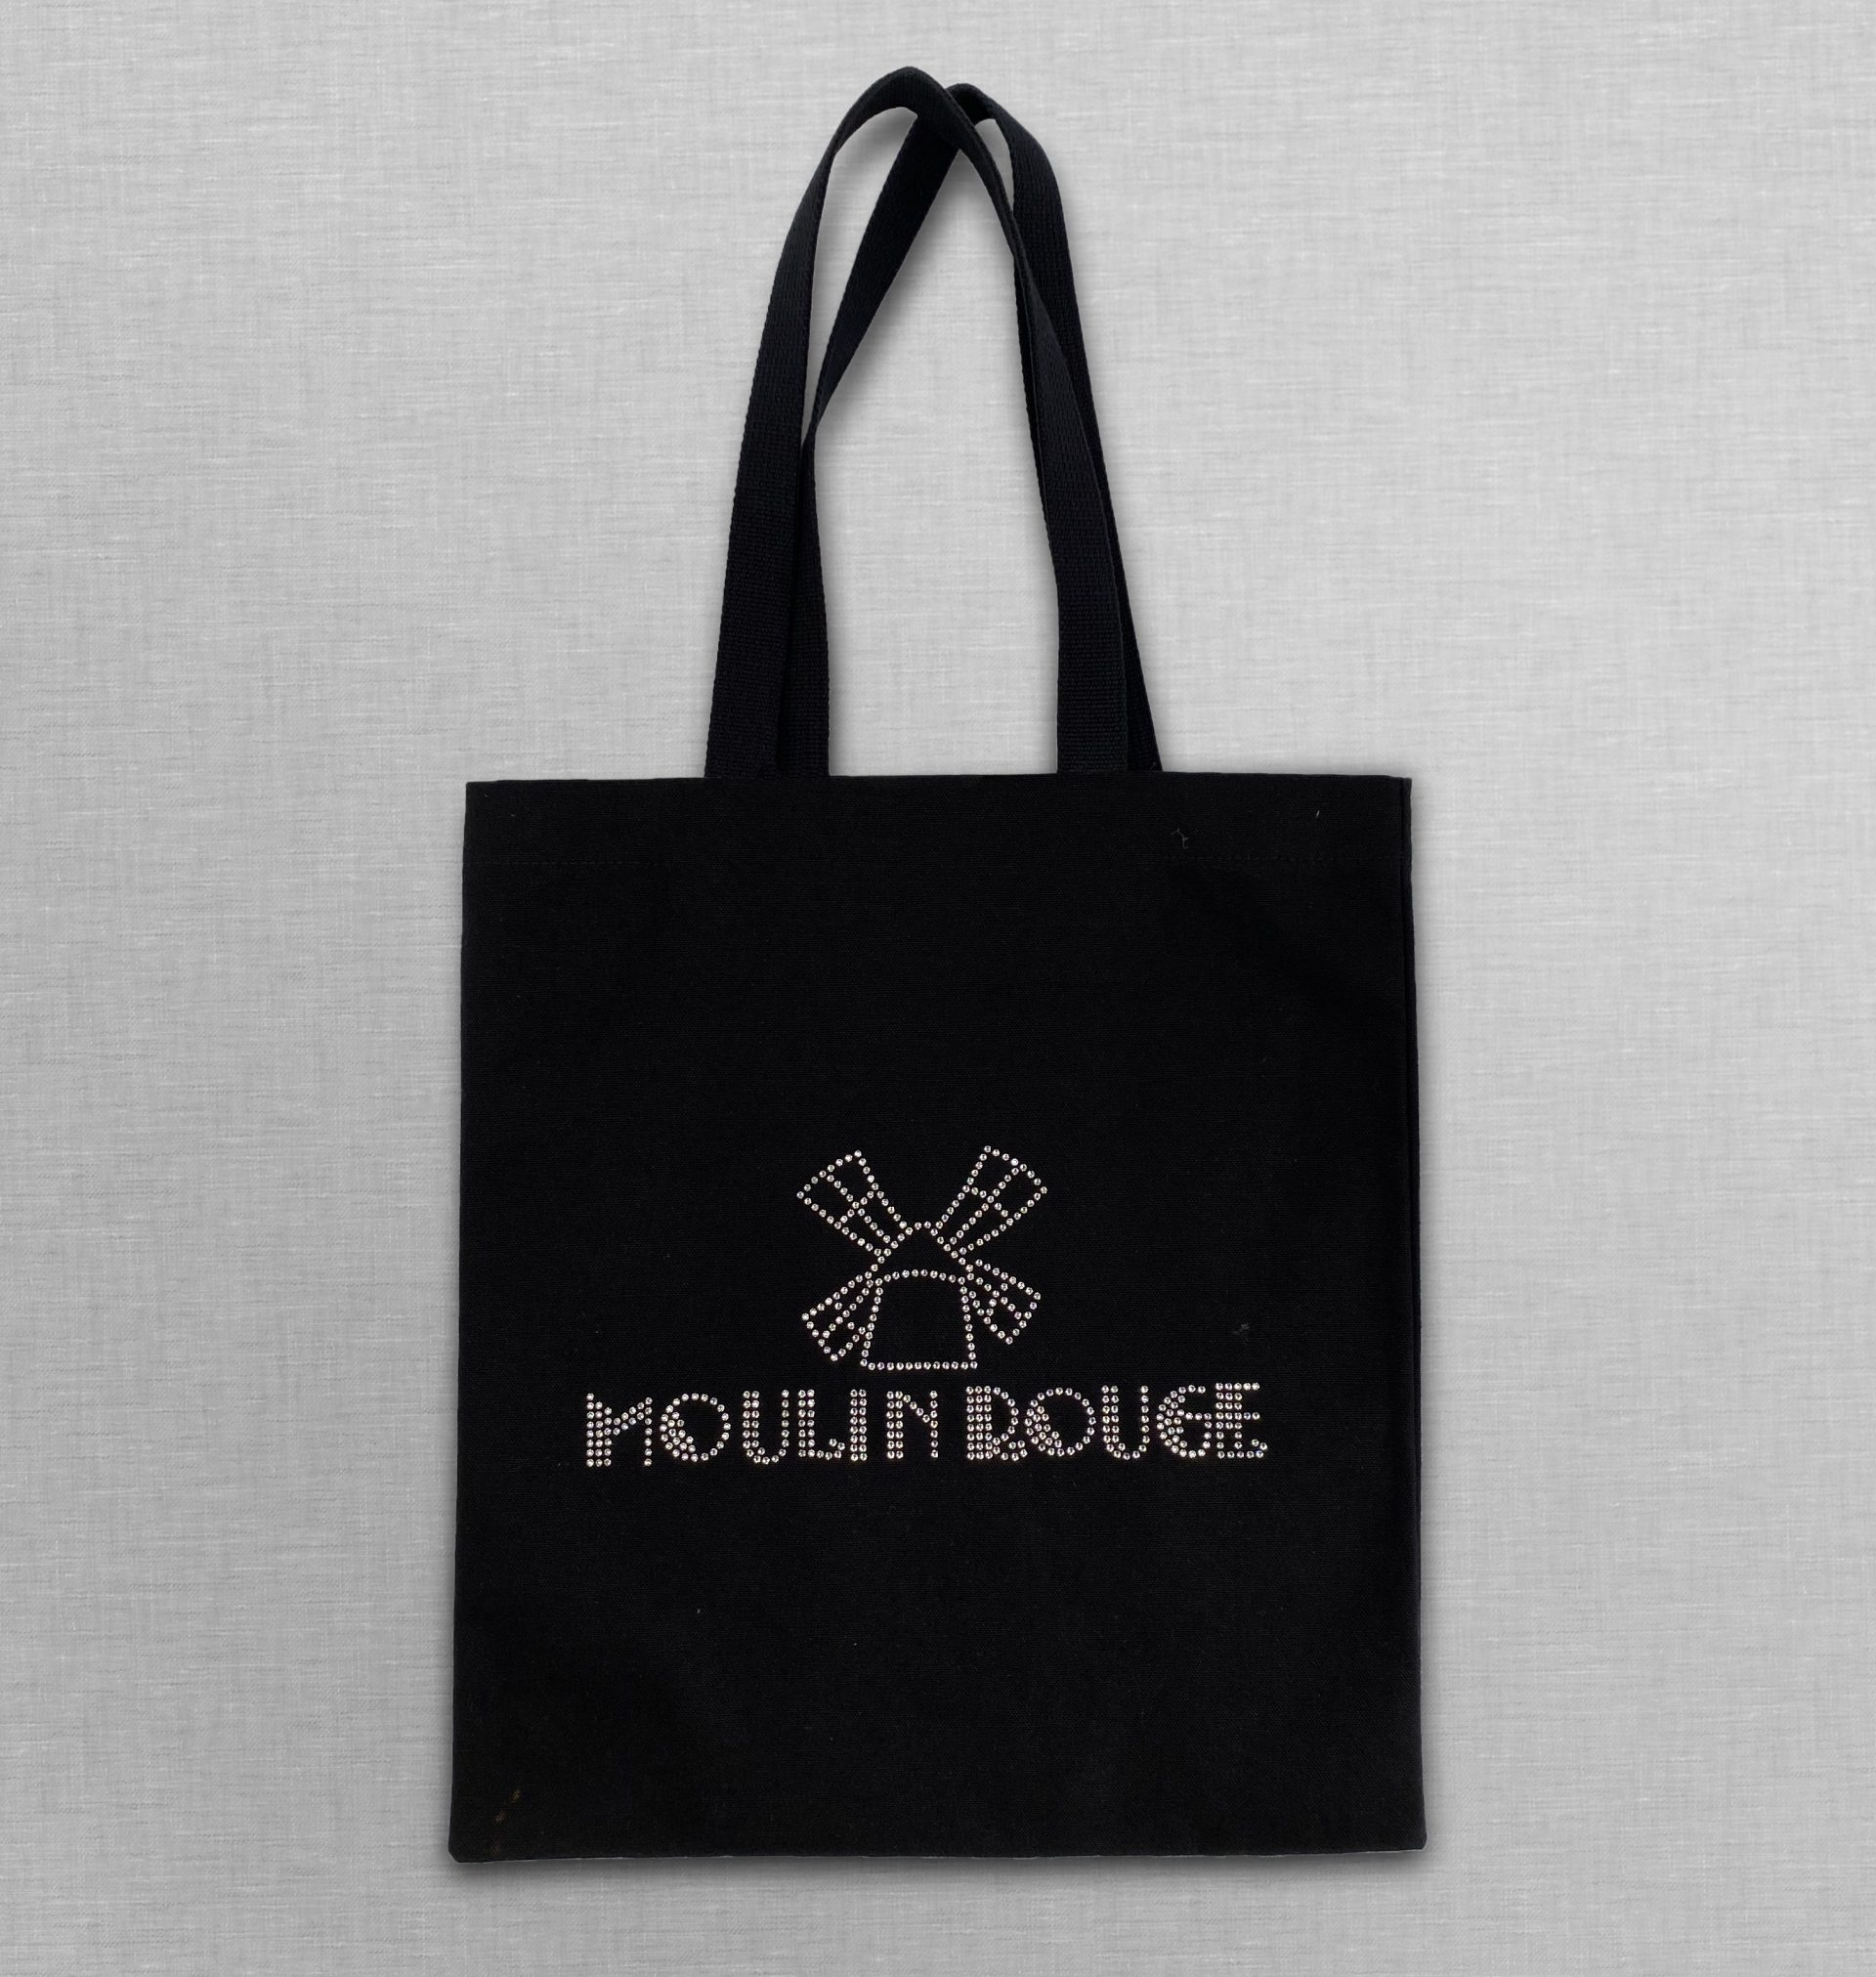 Swarovski® Moulin Rouge tote bag